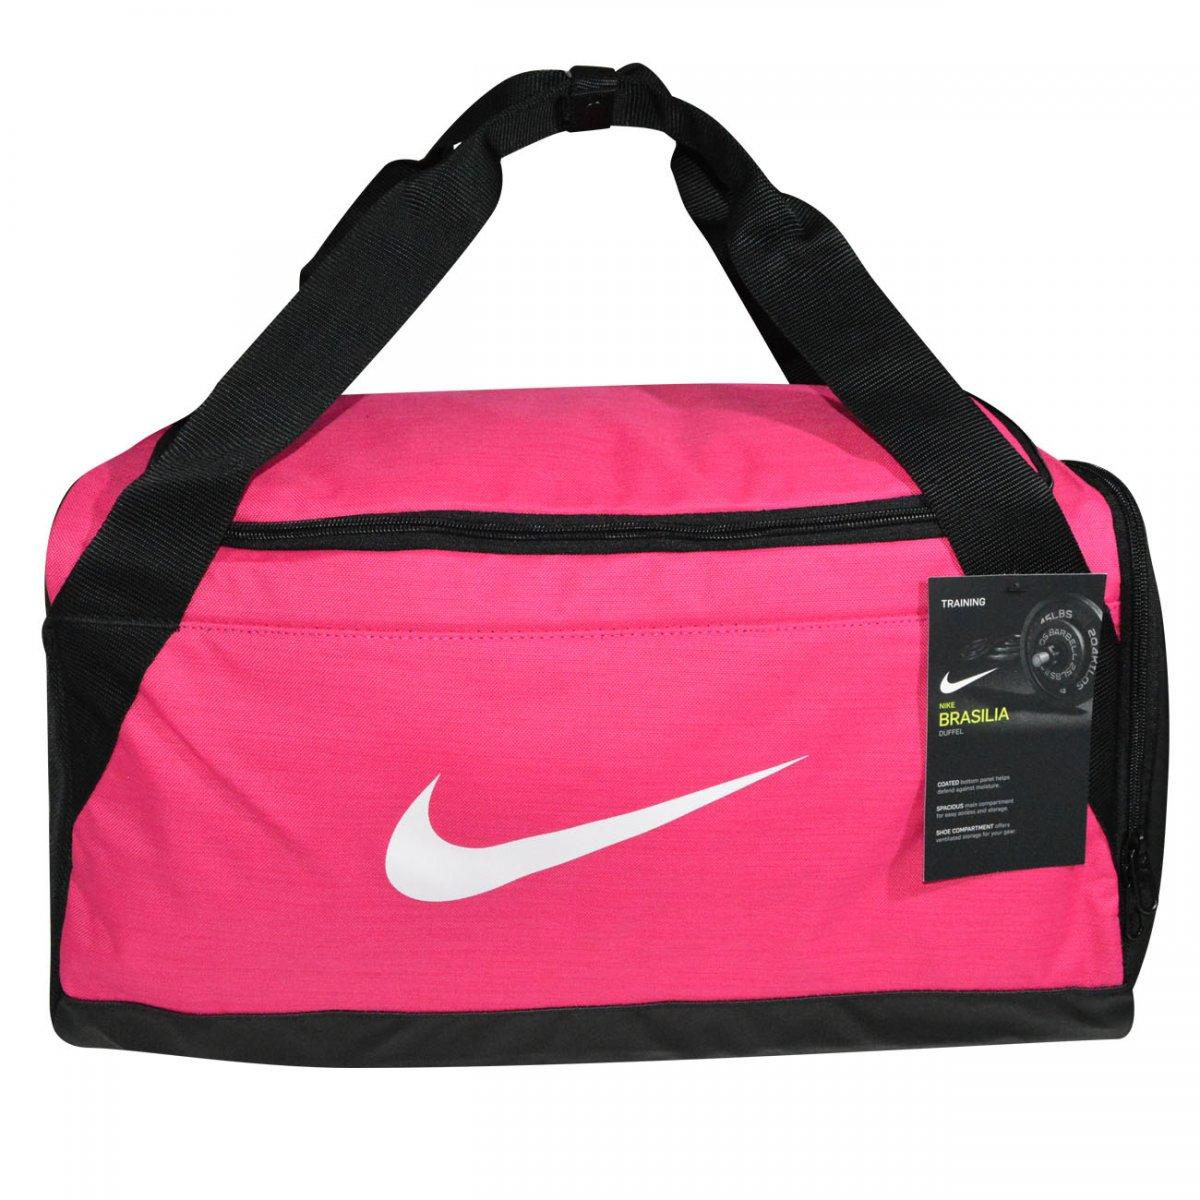 Chuteira Ba5335 Nike NikeAdidas Bolsa Rosapreto 616 dthBCxsQor